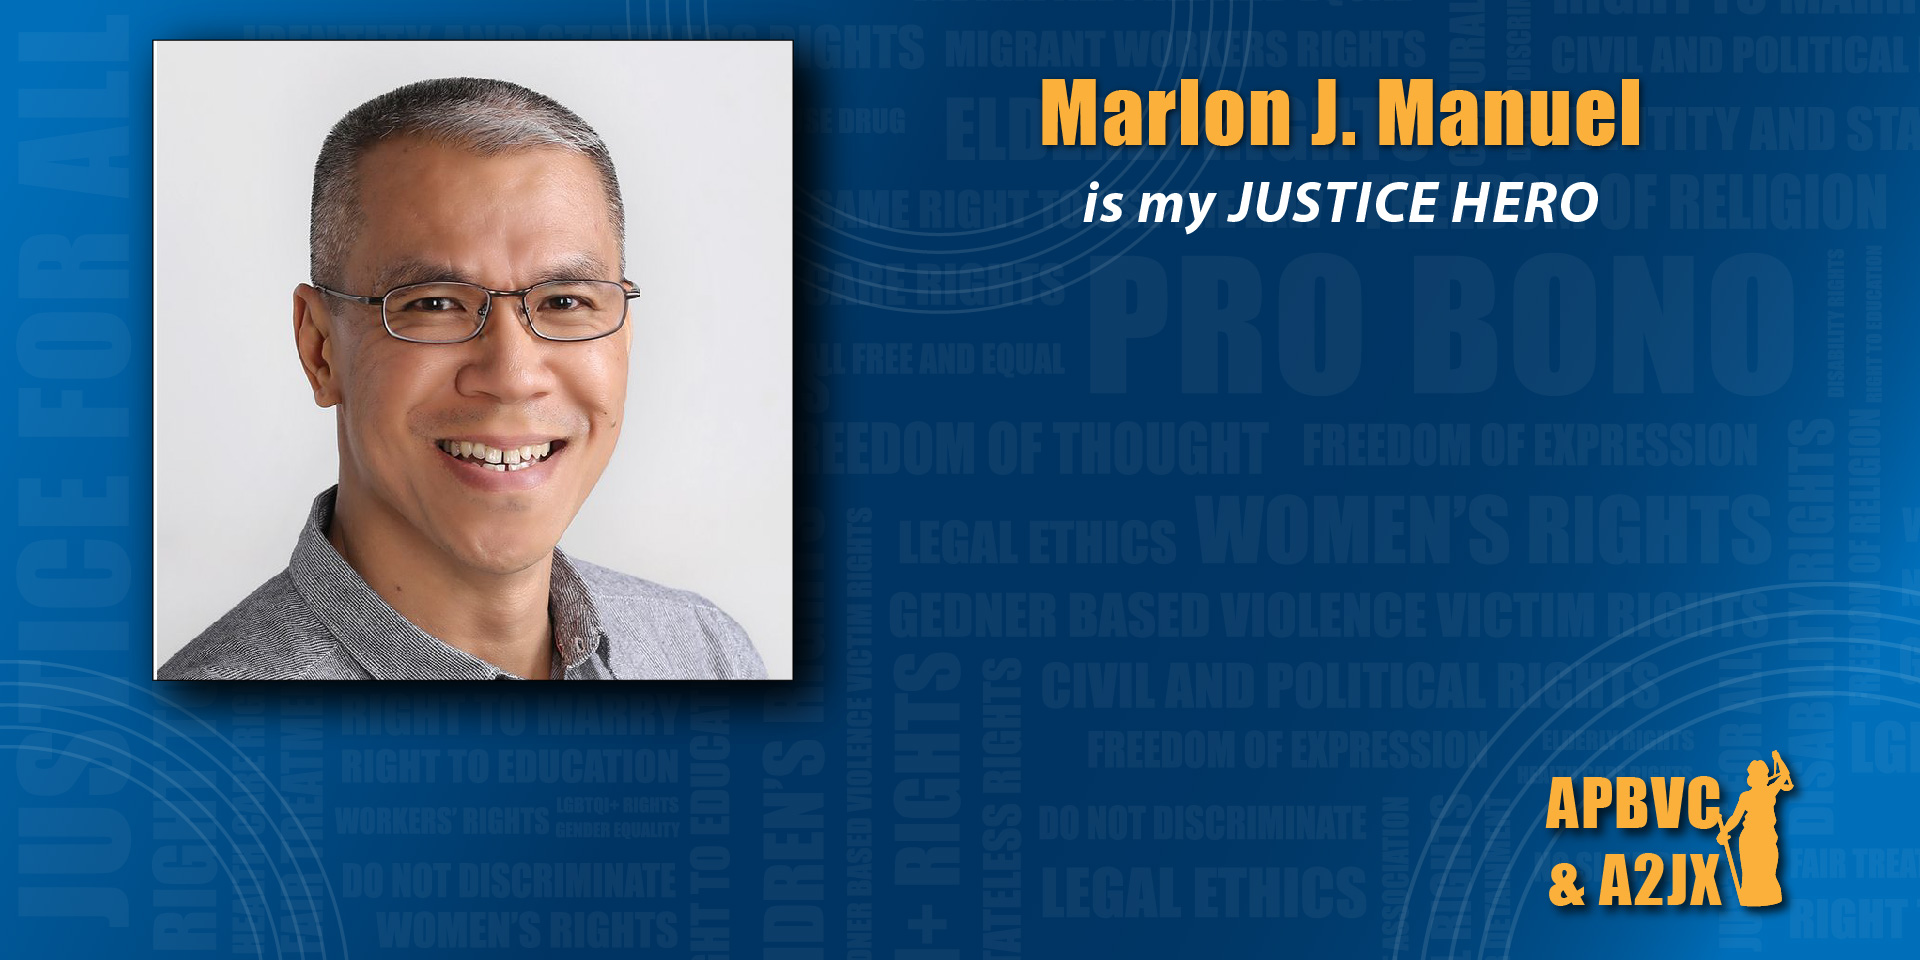 Marlon J. Manuel